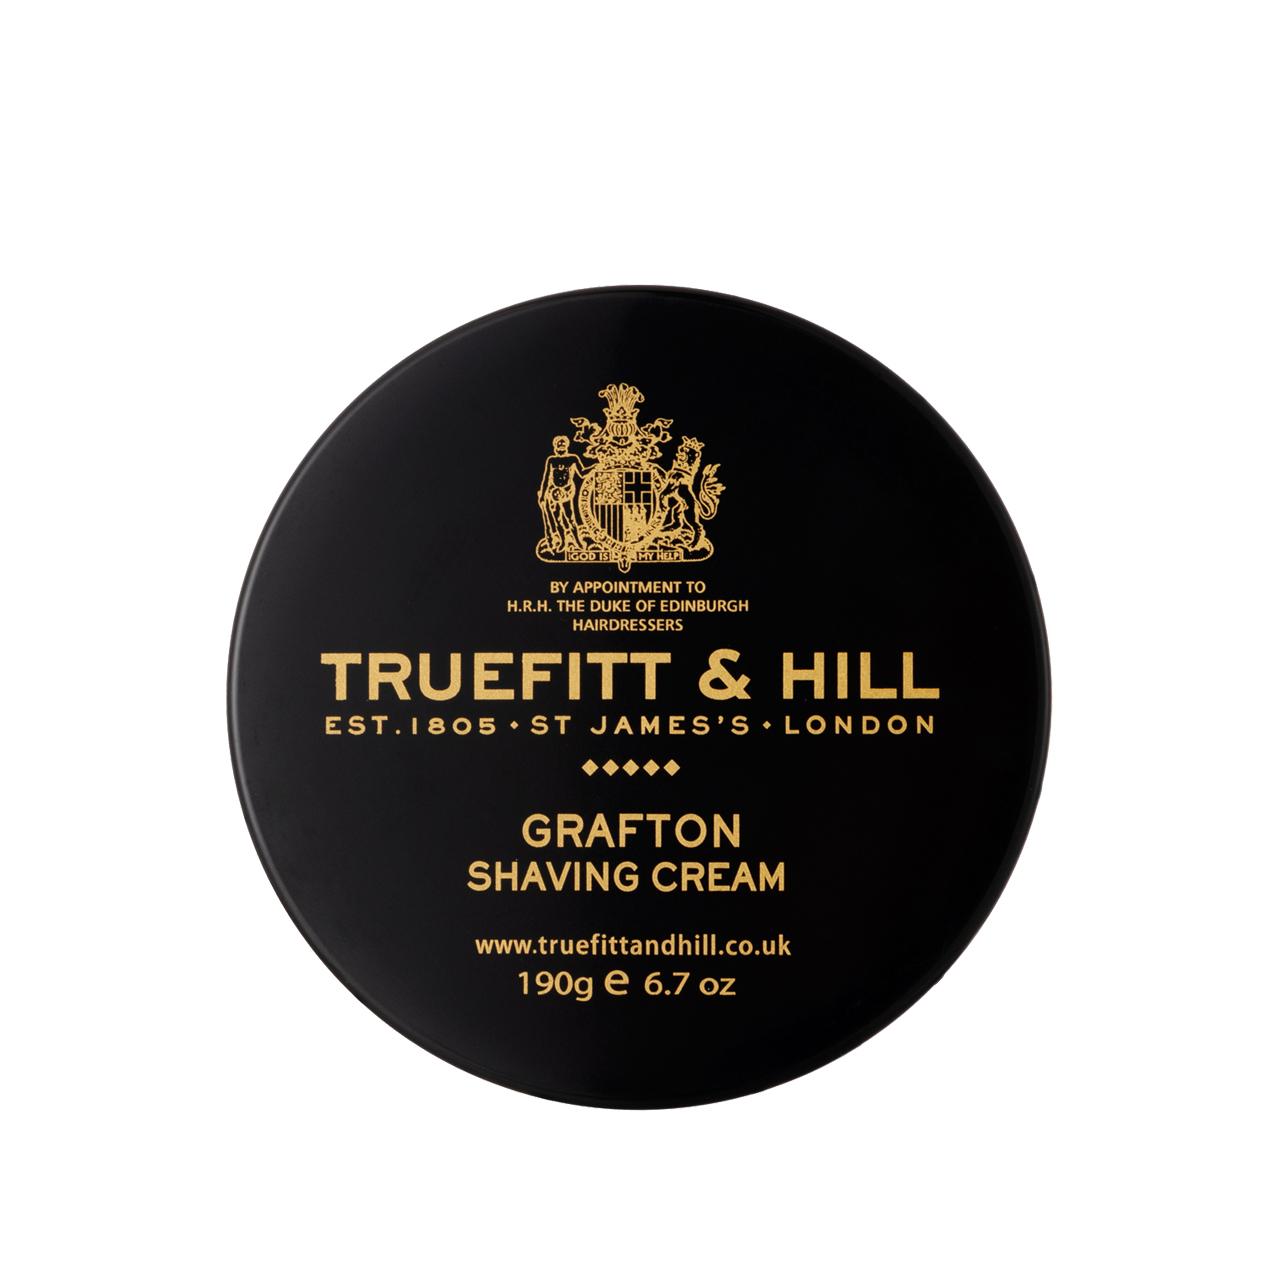 Grafton - Shaving Cream Bowl